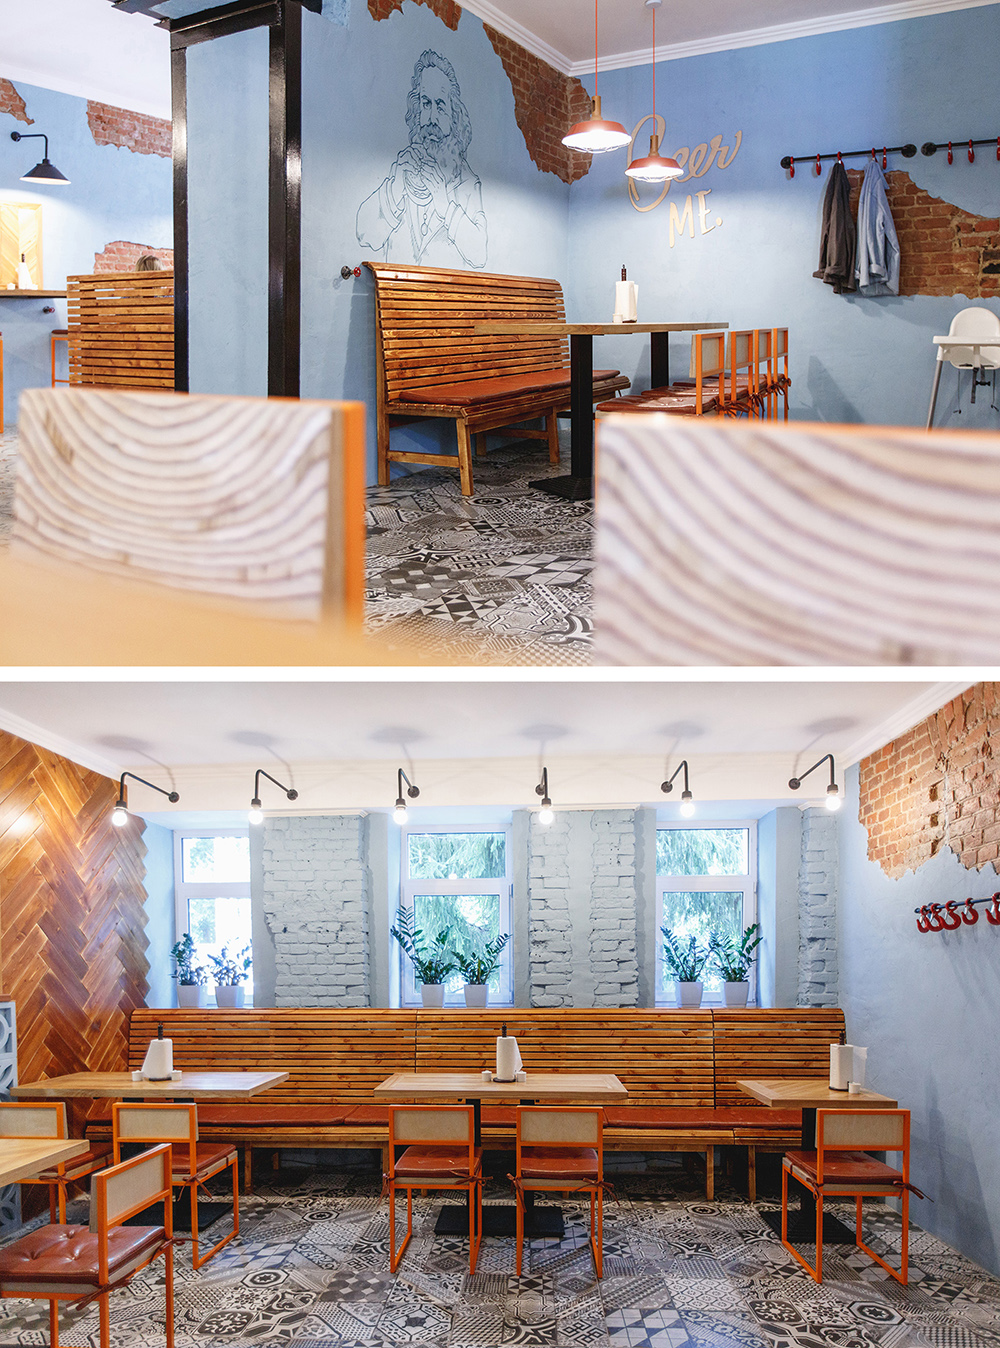 Karl Marks burgers interior | Orel